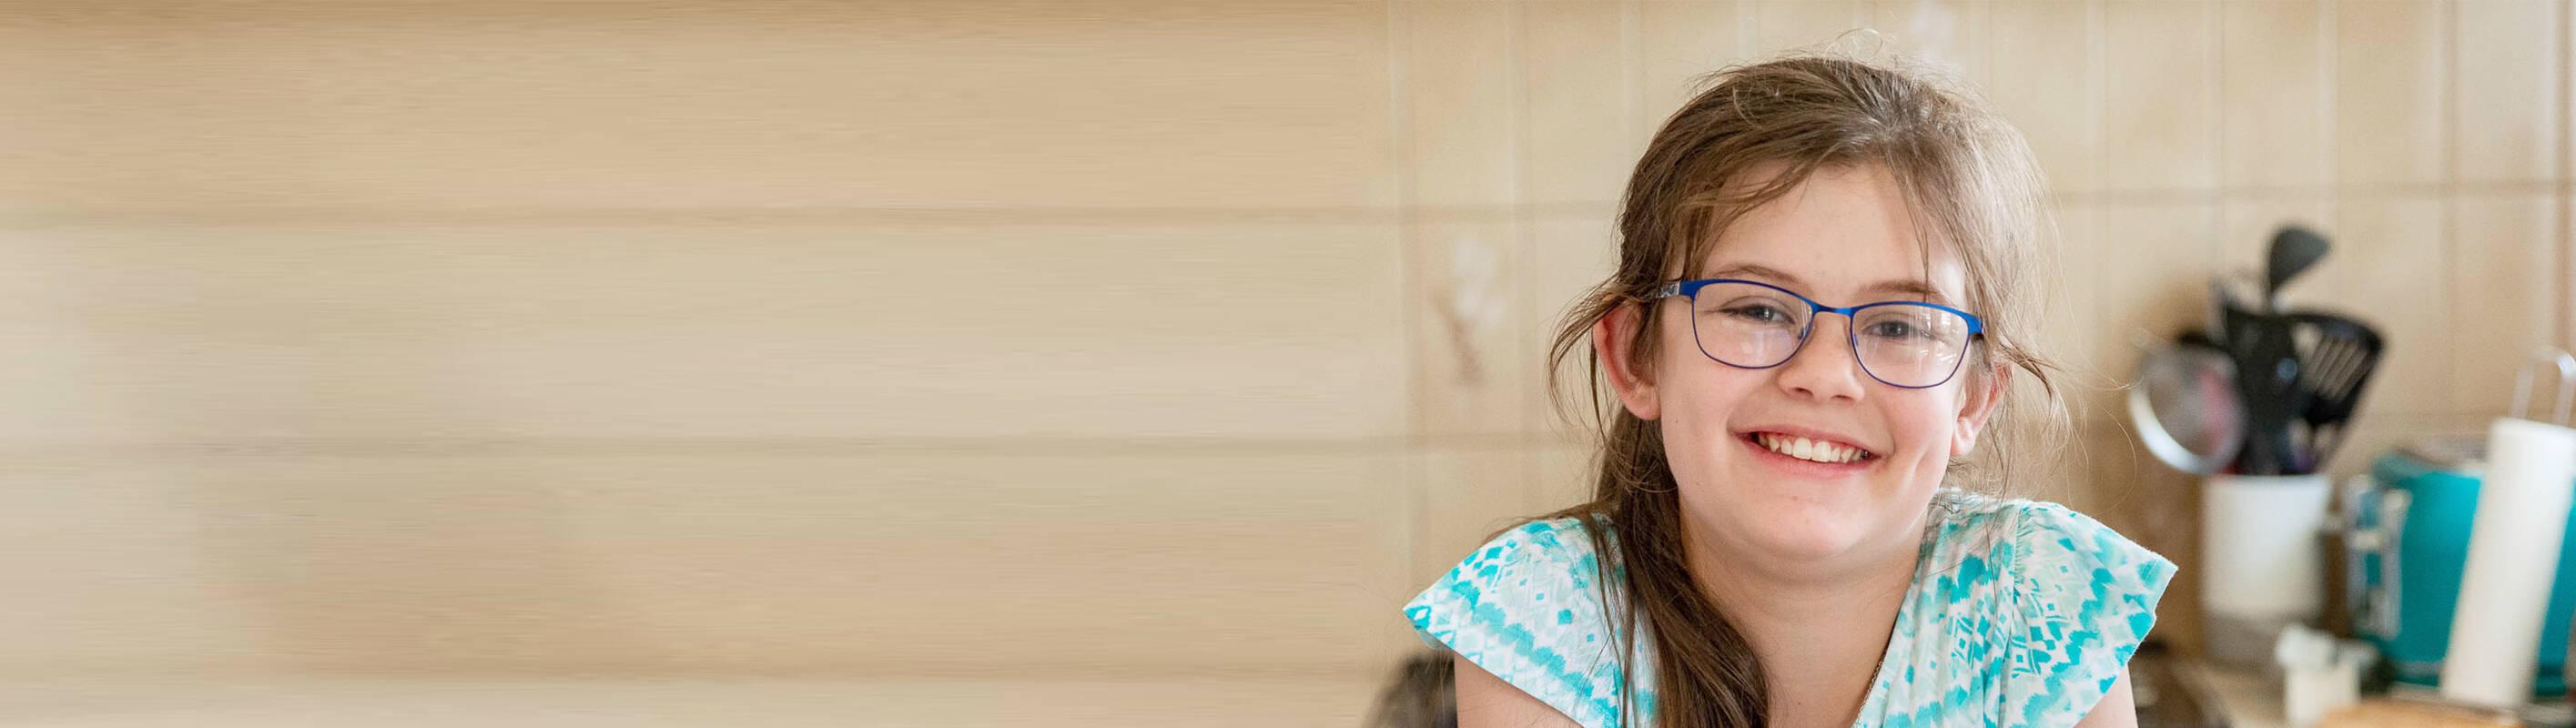 Make A Wish Australia, Children's Charity - Abbey baking in the kitchen